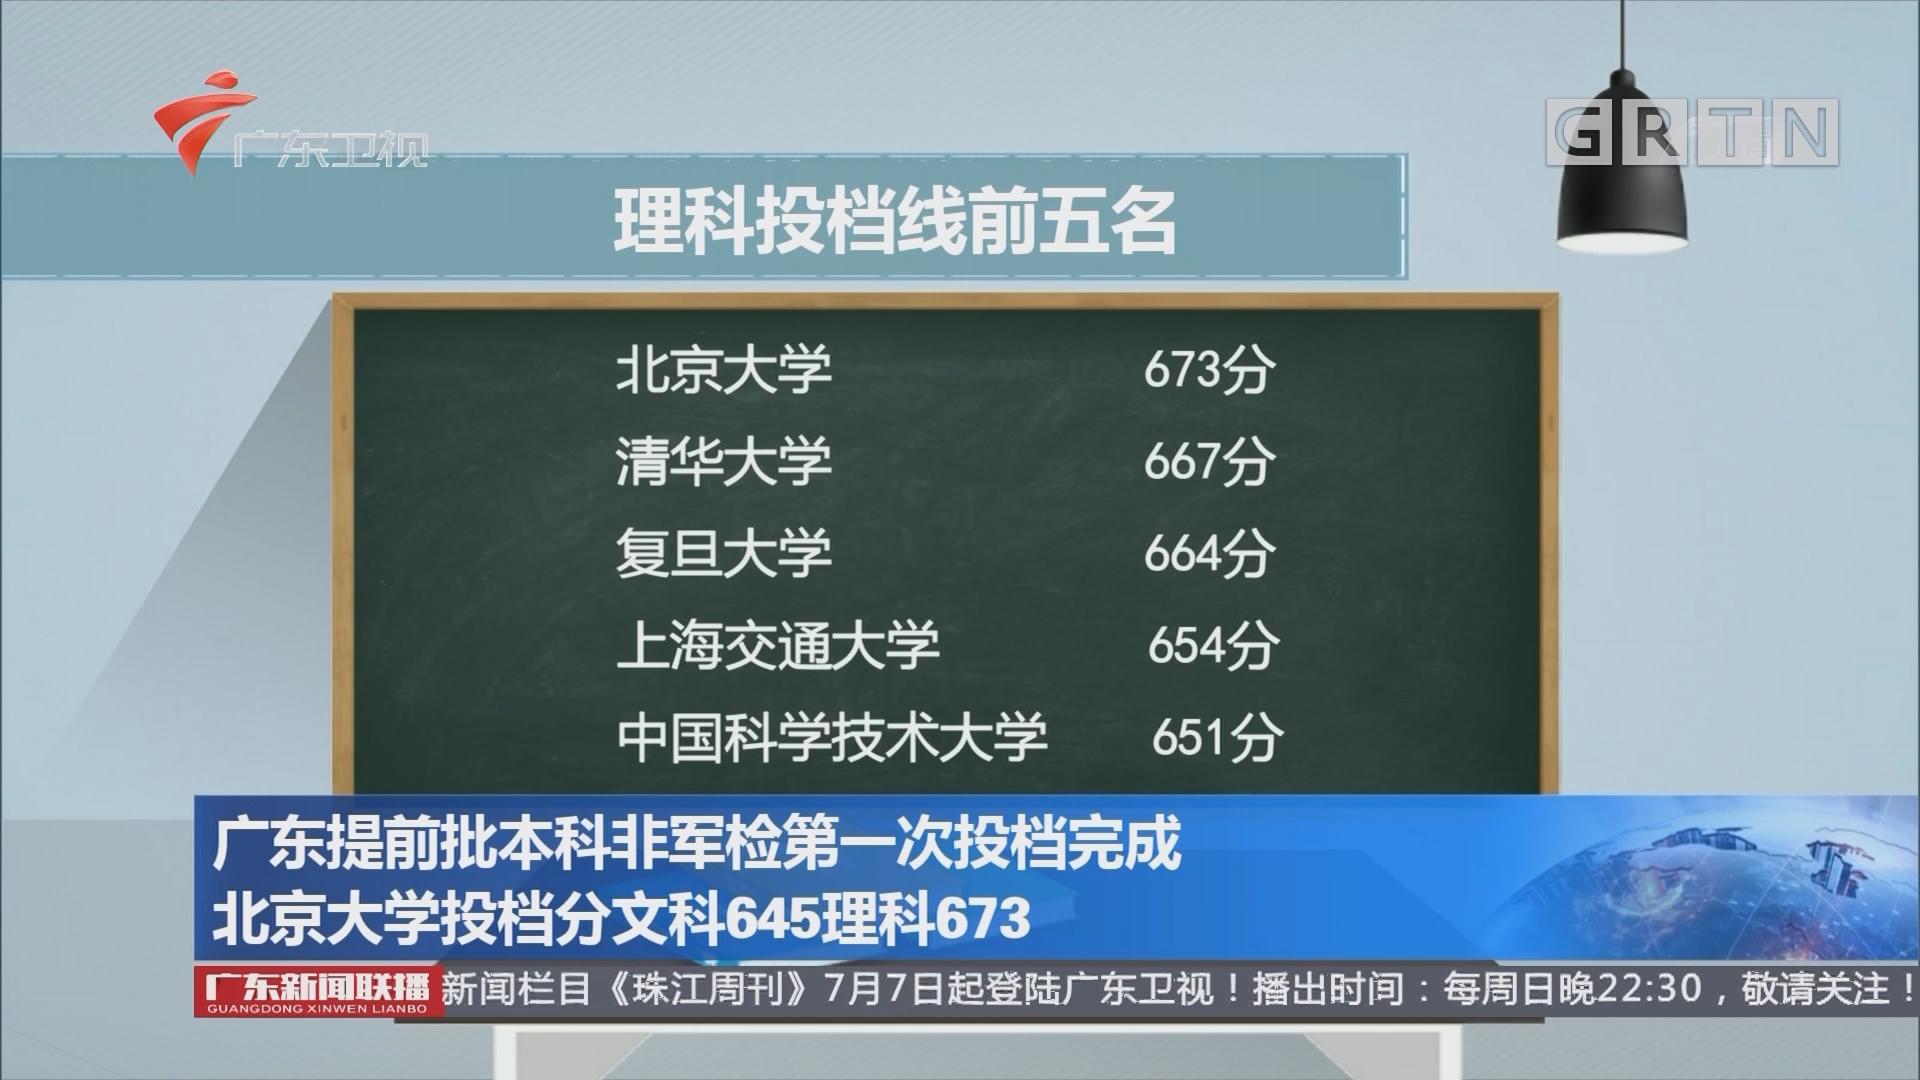 manbetx手机版 - 登陆提前批本科非军检第一次投档完成 北京大学投档分文科645理科673